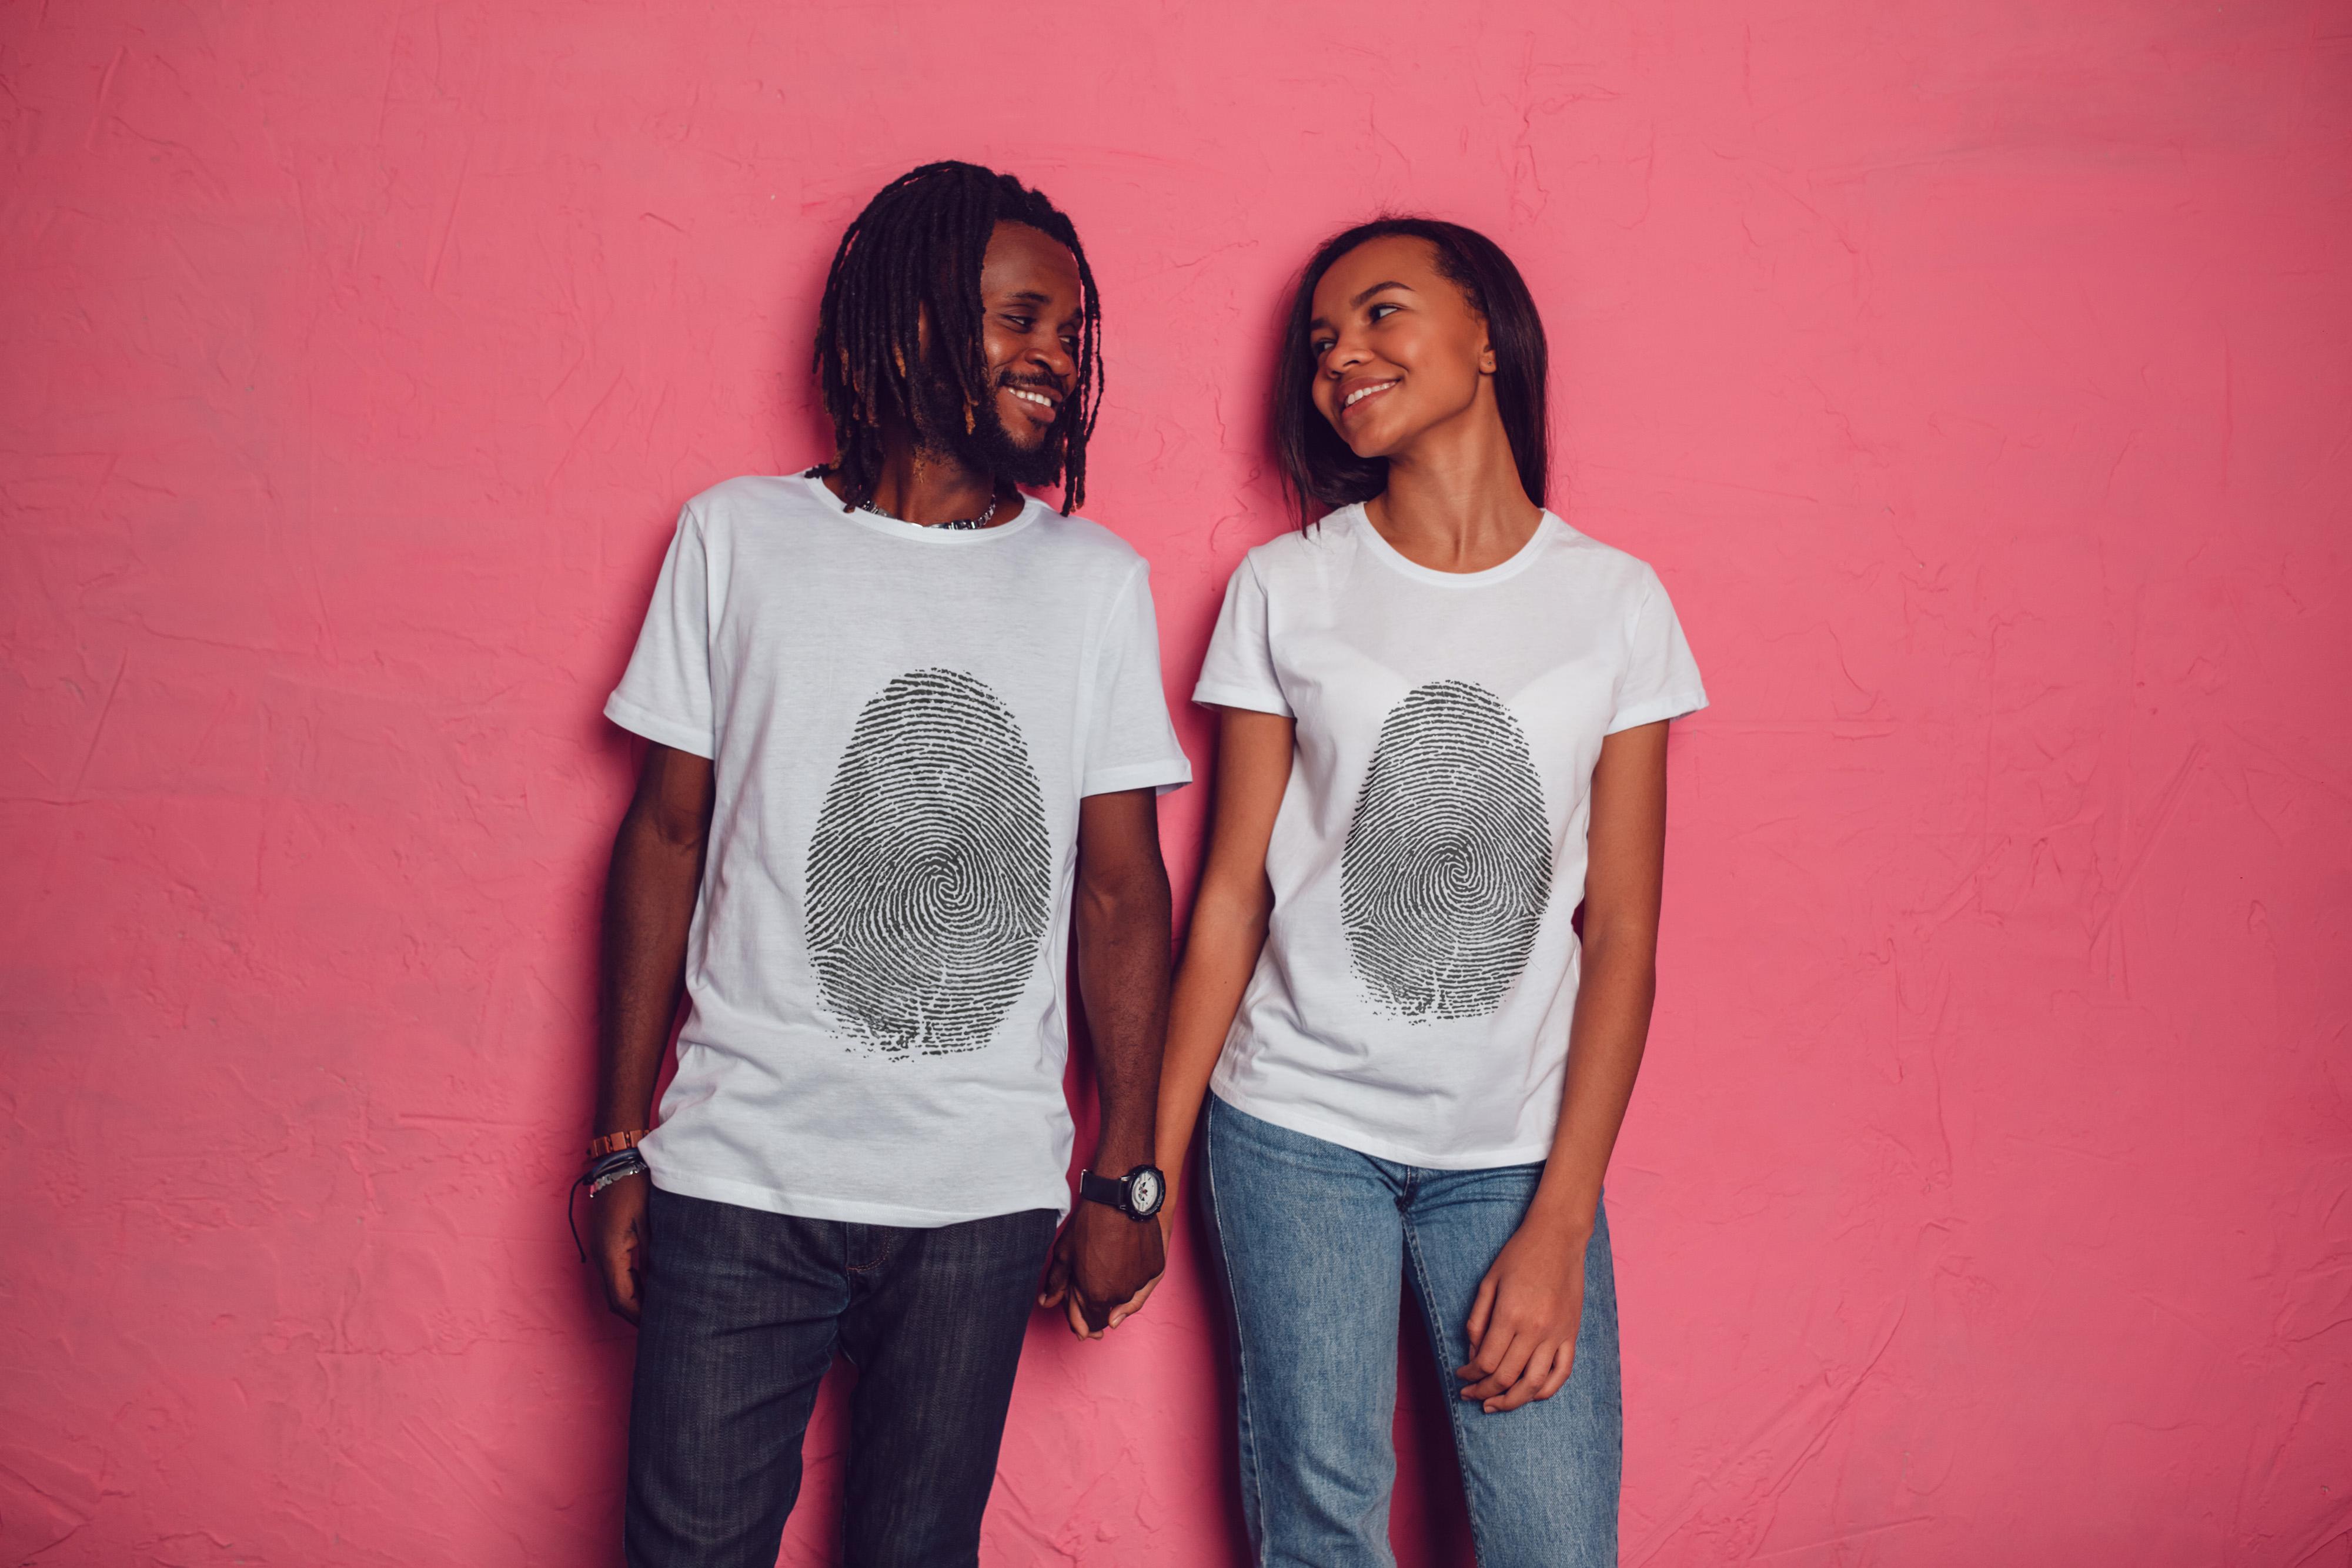 T-Shirt Mock-Up 2018 #1 example image 9